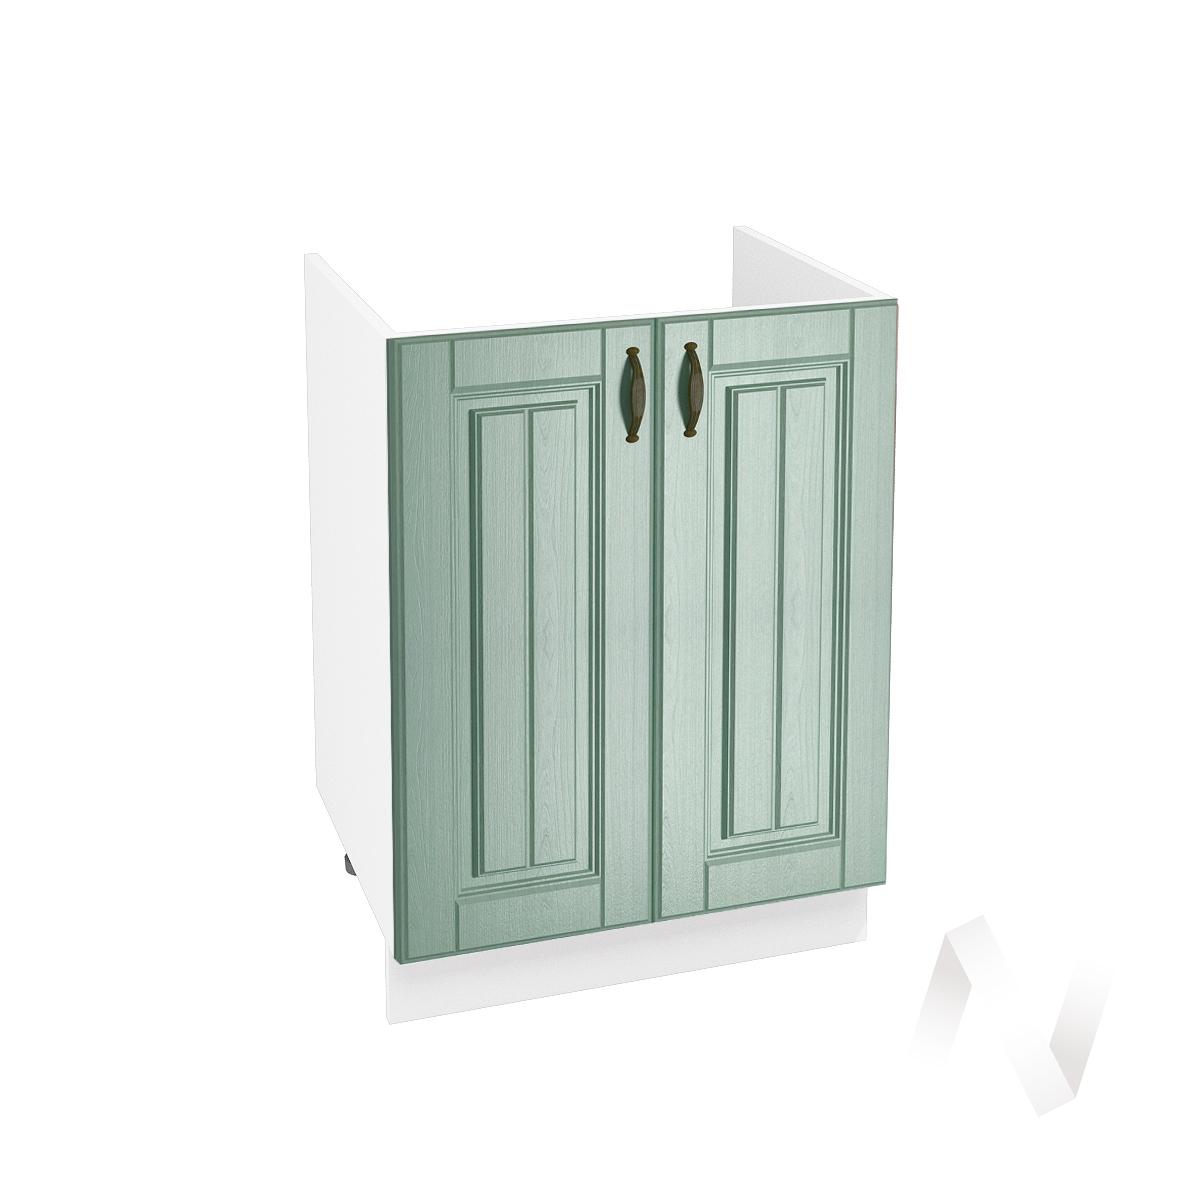 "Кухня ""Прованс"": Шкаф нижний под мойку 600, ШНМ 600 новый (корпус белый)"